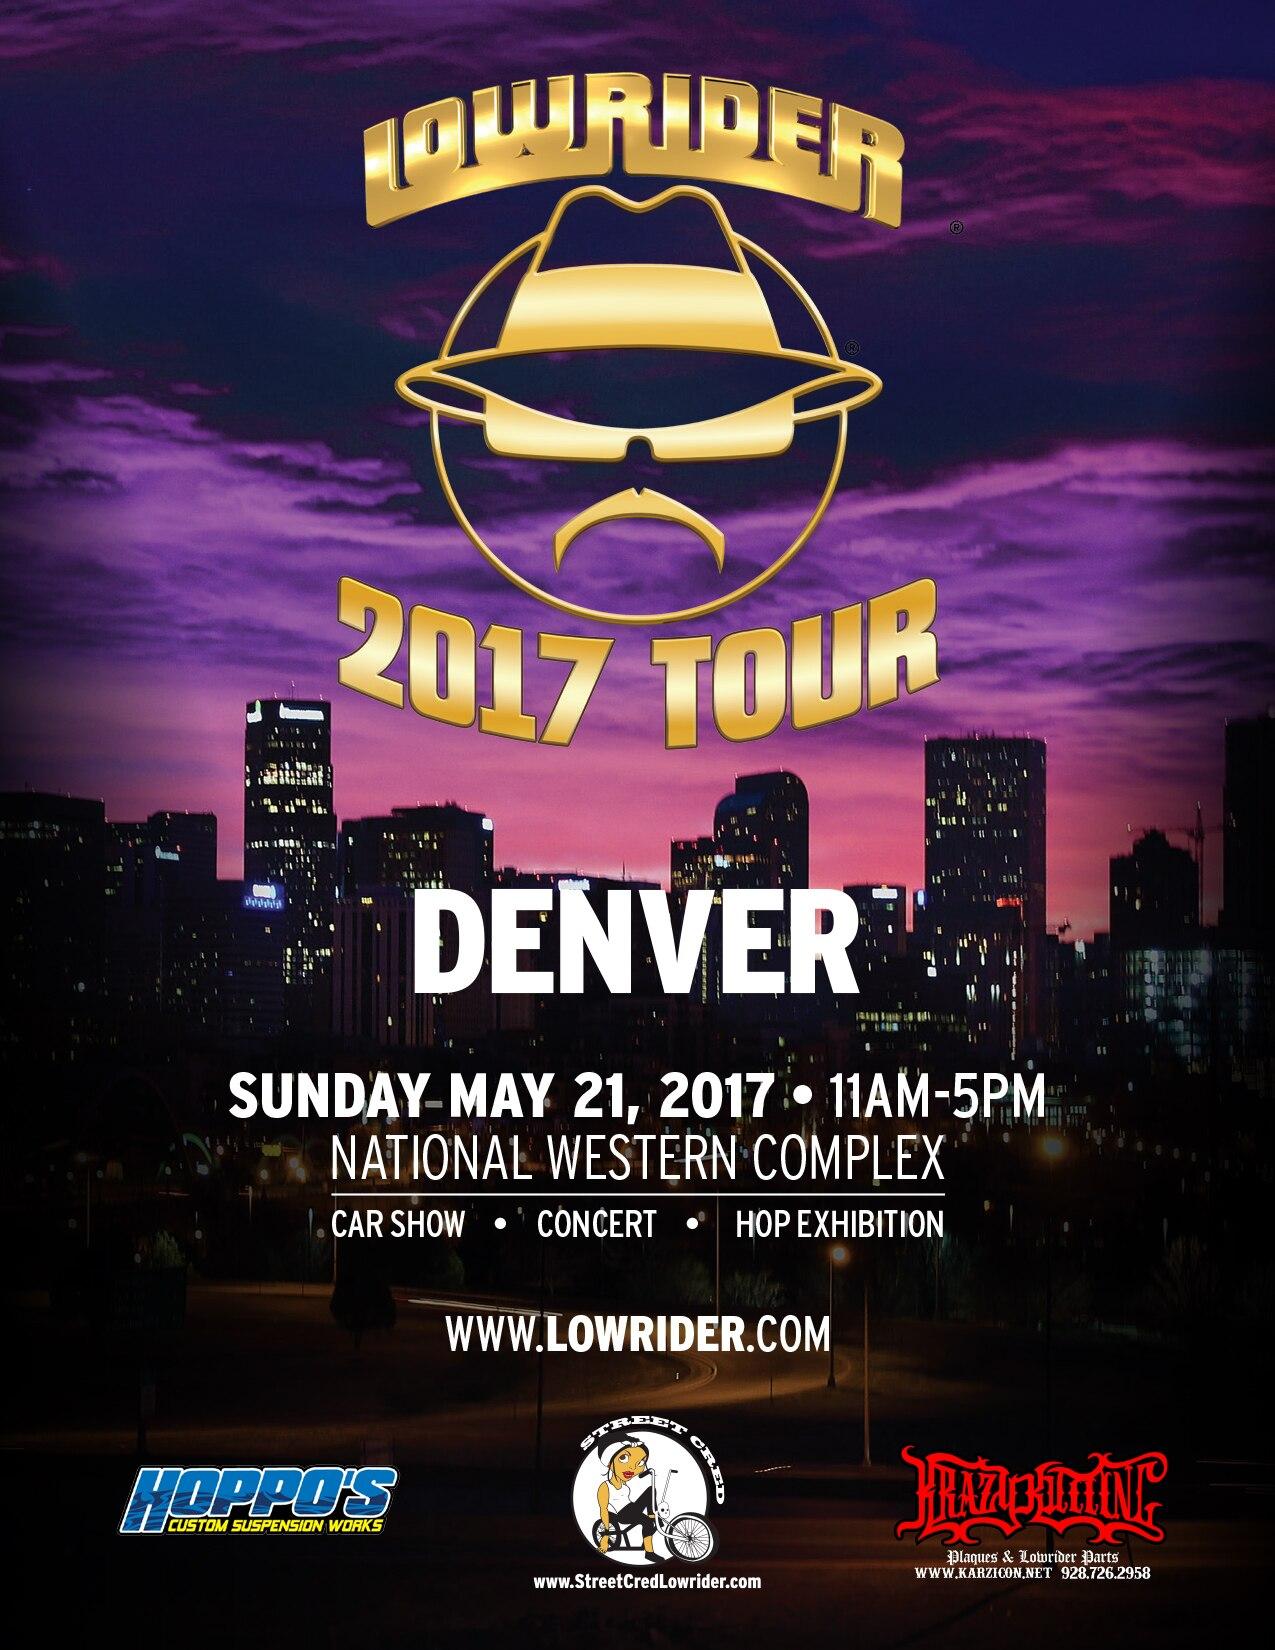 lowrider tour dever promo 2